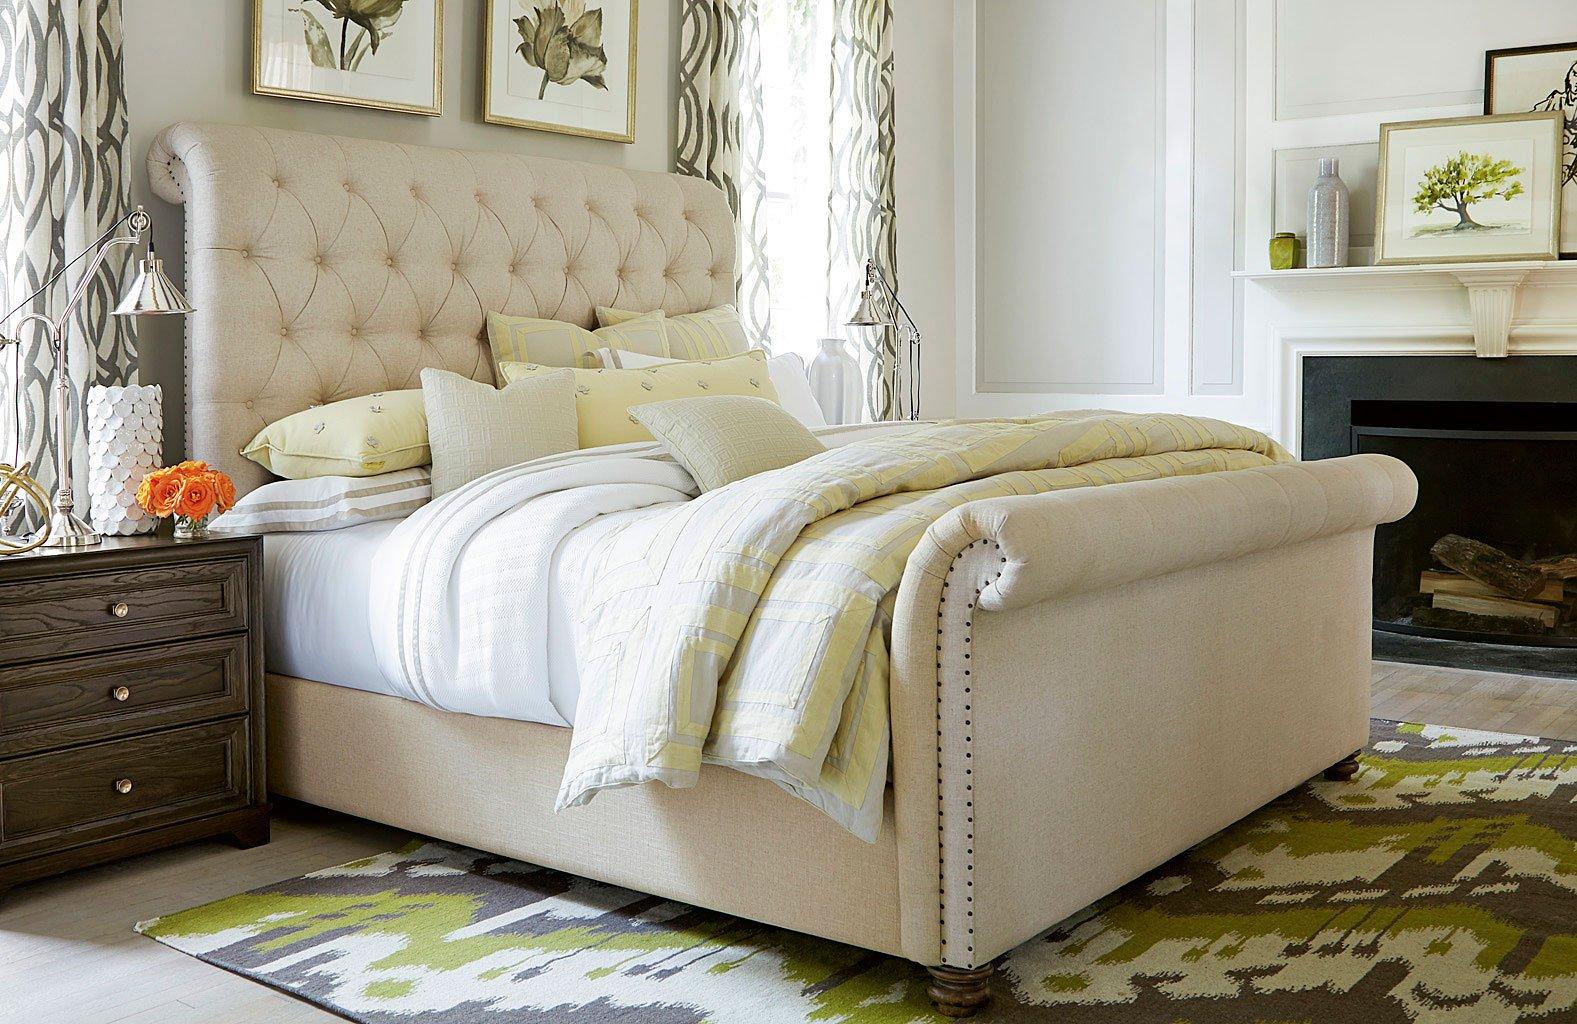 California Bedroom Set W/ Boho Chic Bed (Hollywood Hills